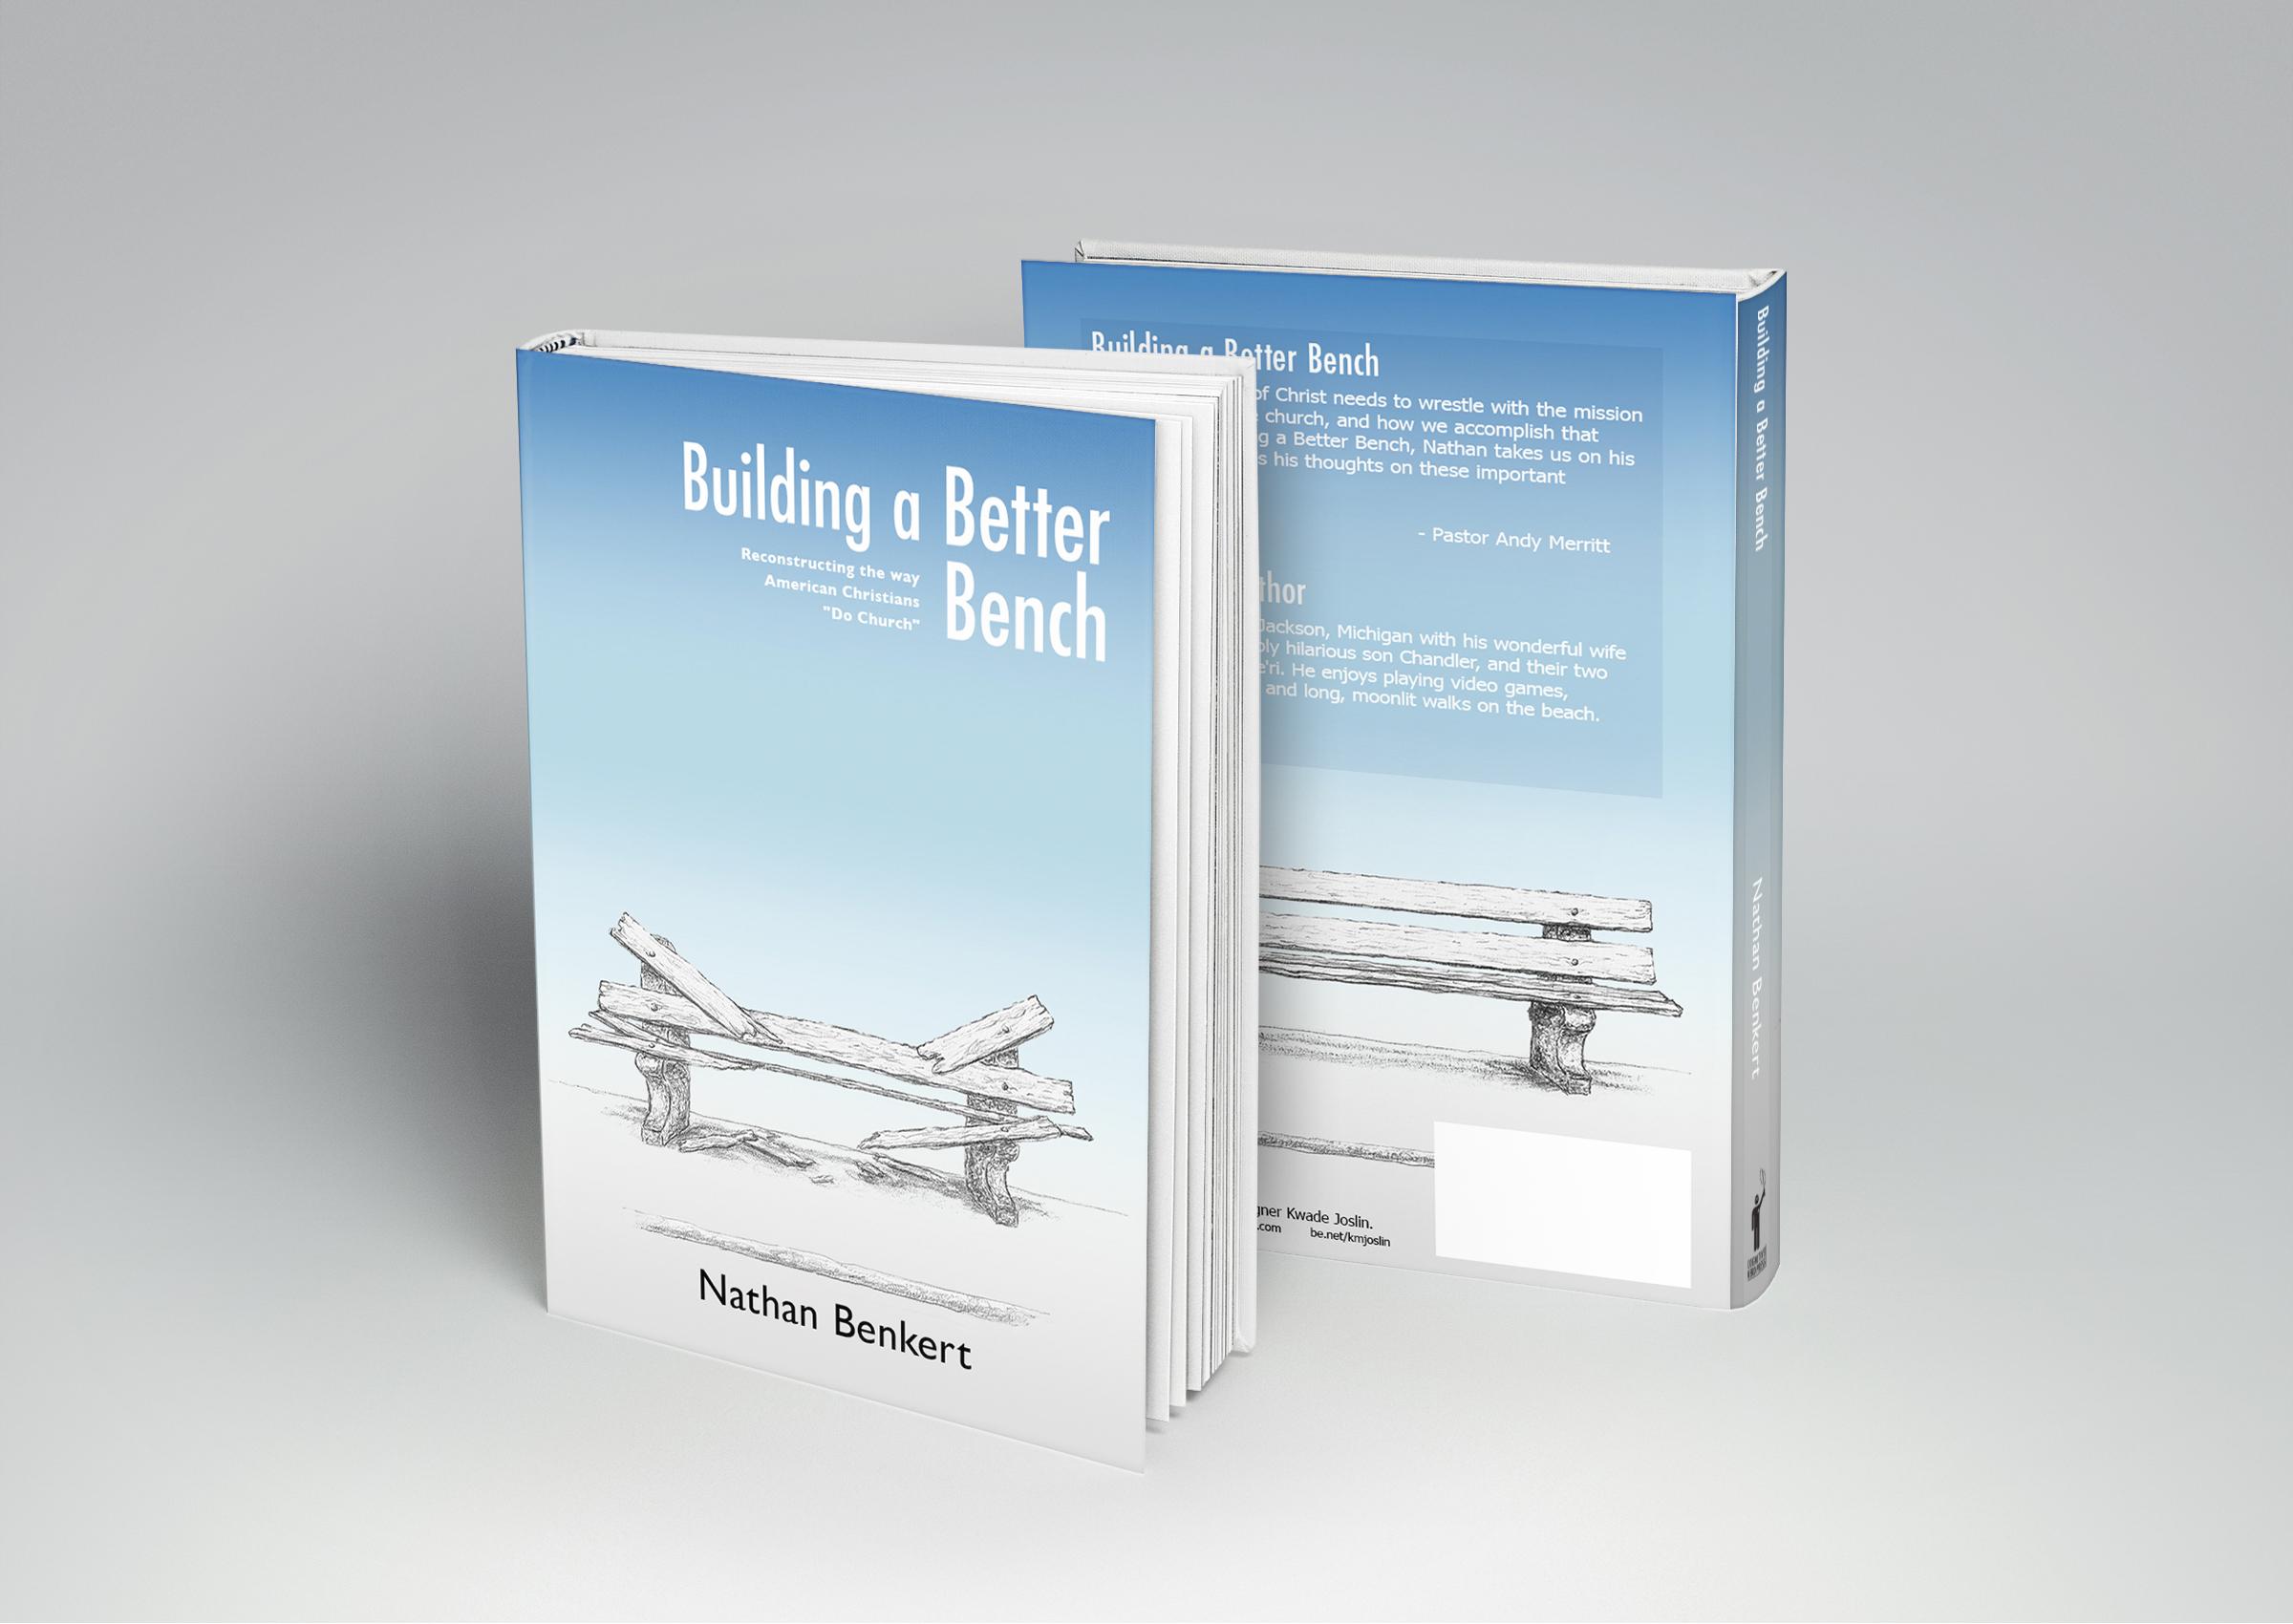 Building a Better Bench